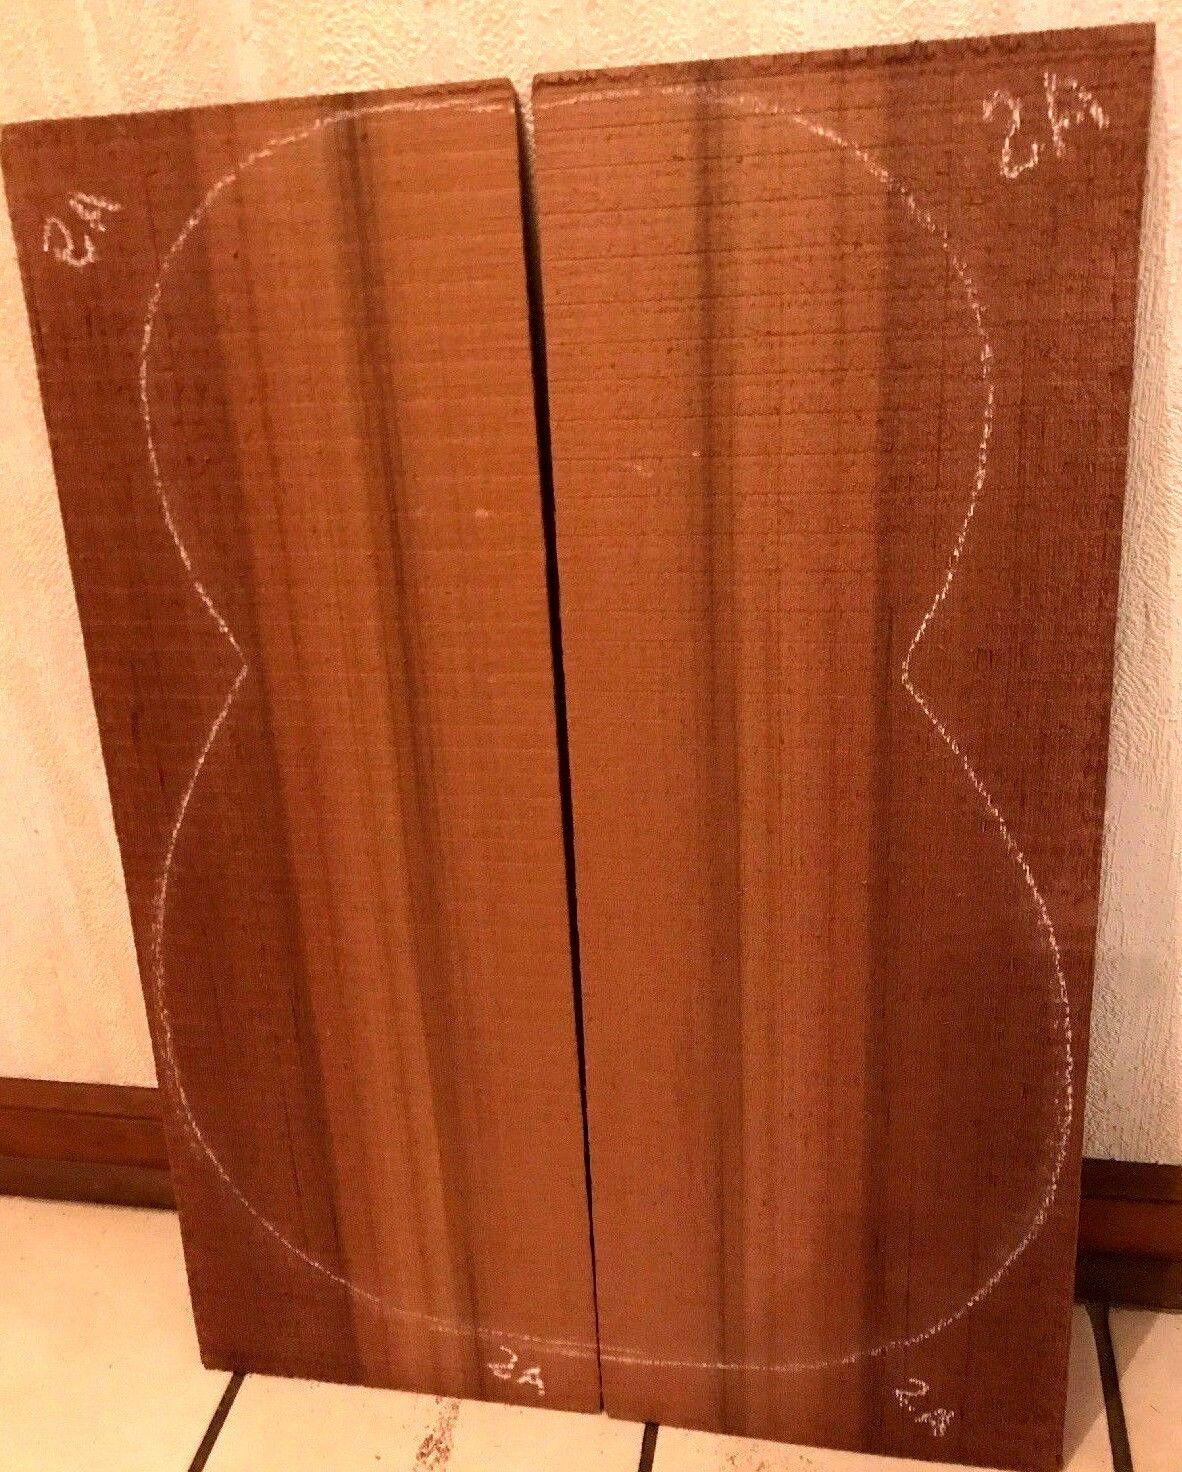 Western ROT Cedar Luthier Wood Guitar Top Set Q/S Book Matched DIY Guitar Timber